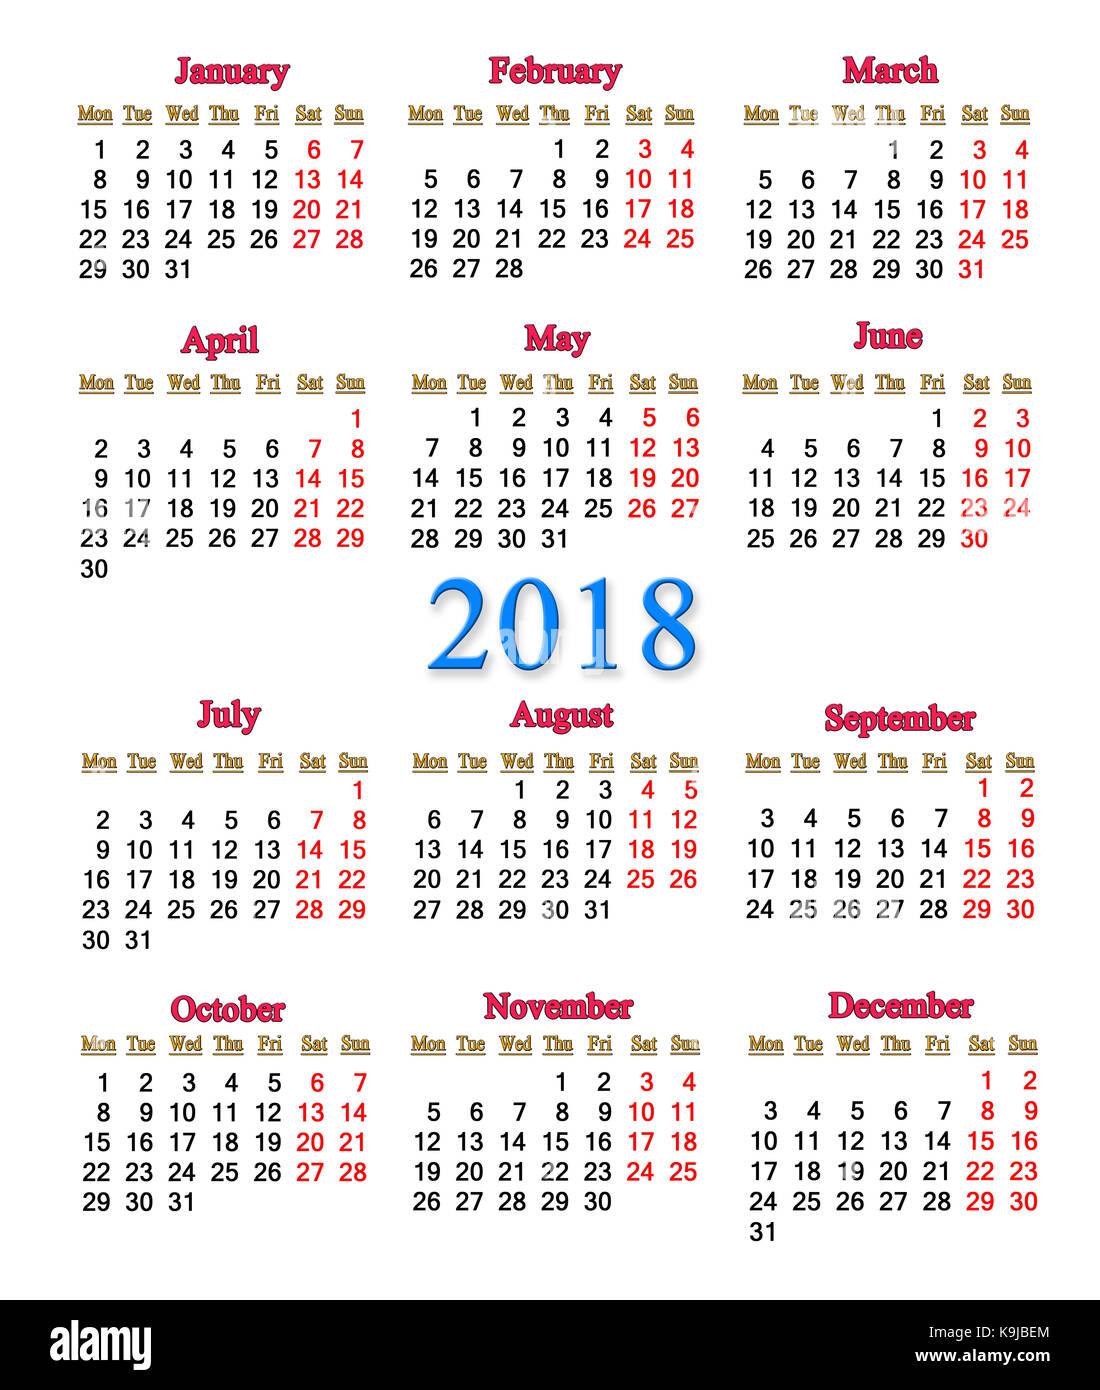 Next Year Calendar : Calendar week on sunday stock photos